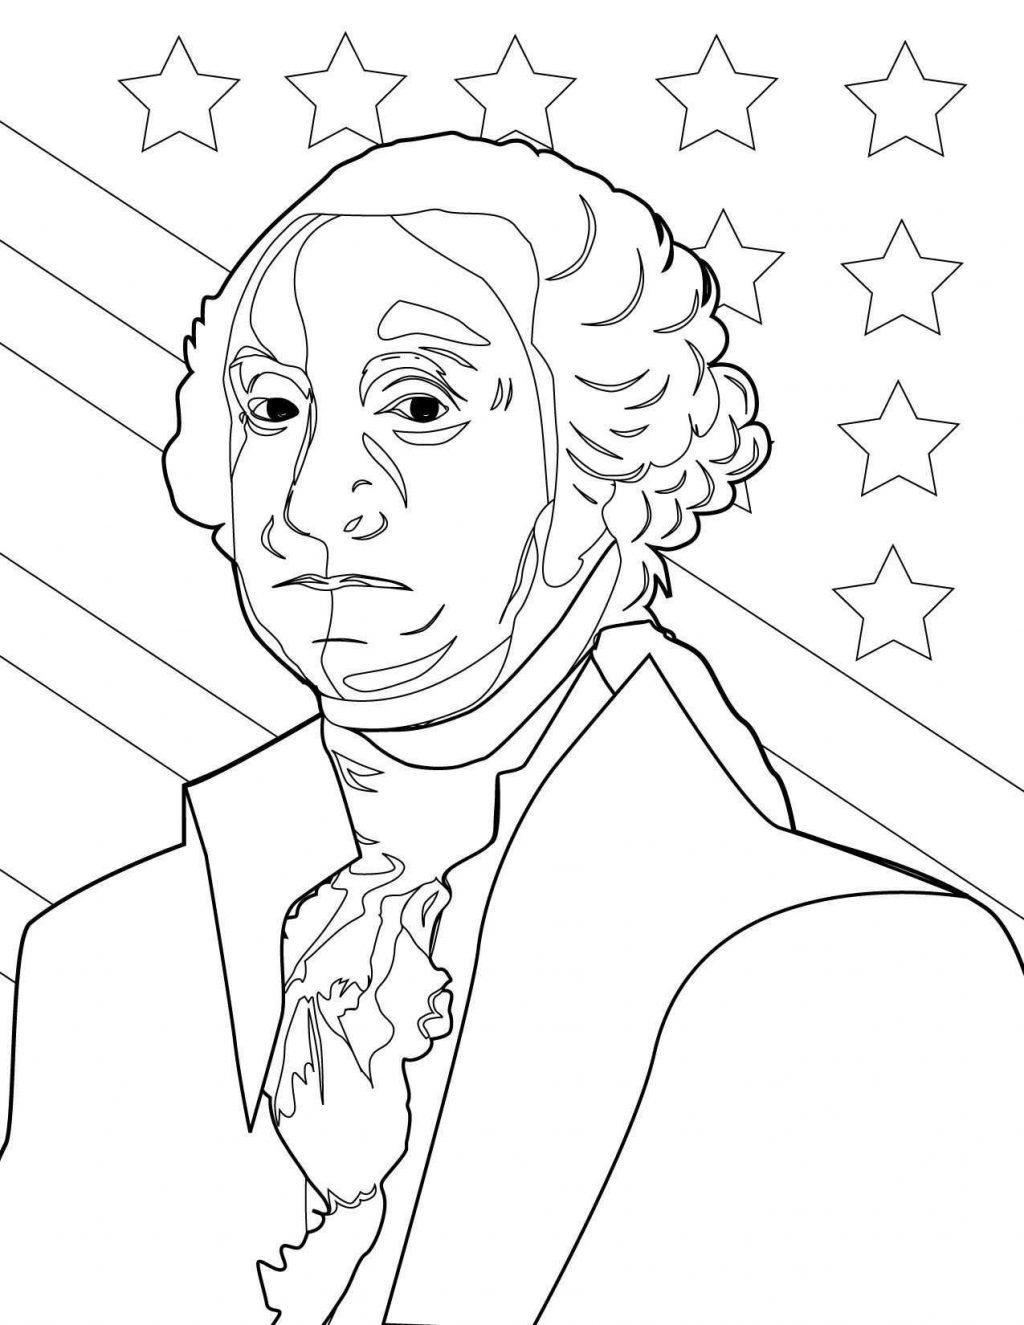 George Washington Carver Coloring Page Coloring Pages Marvelous George Washington Coloring Image Ideas